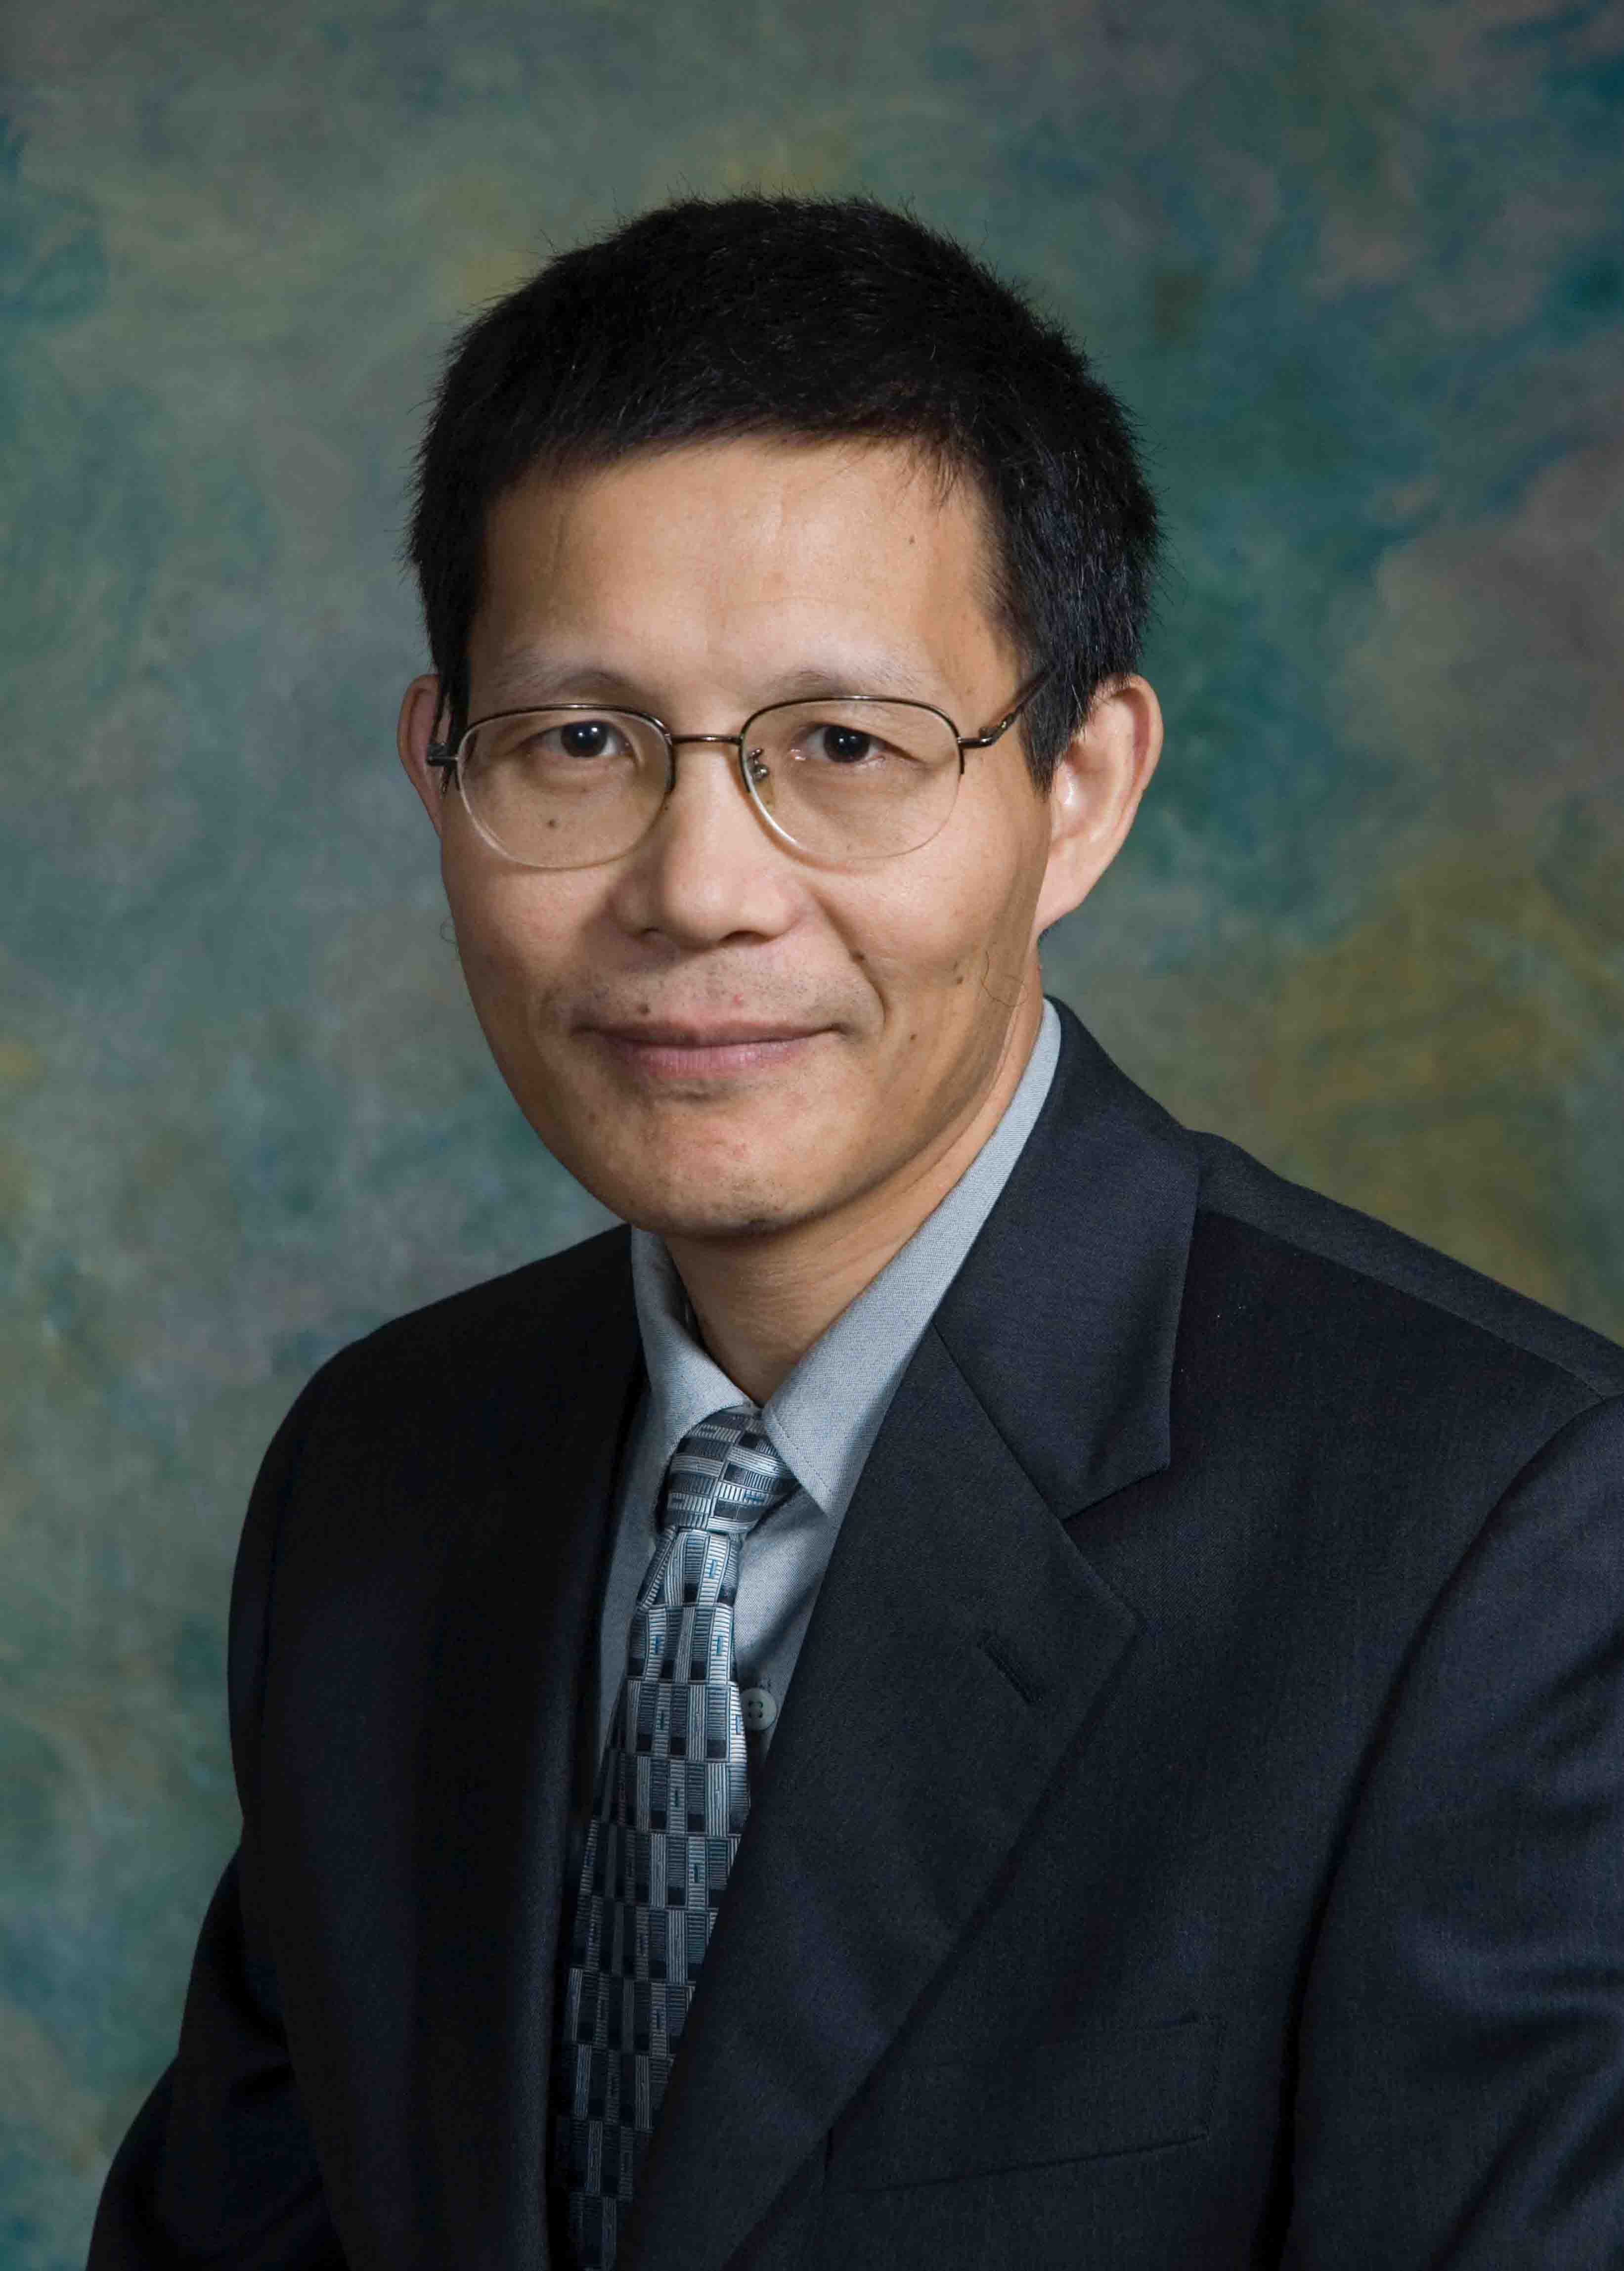 Hualou Liang